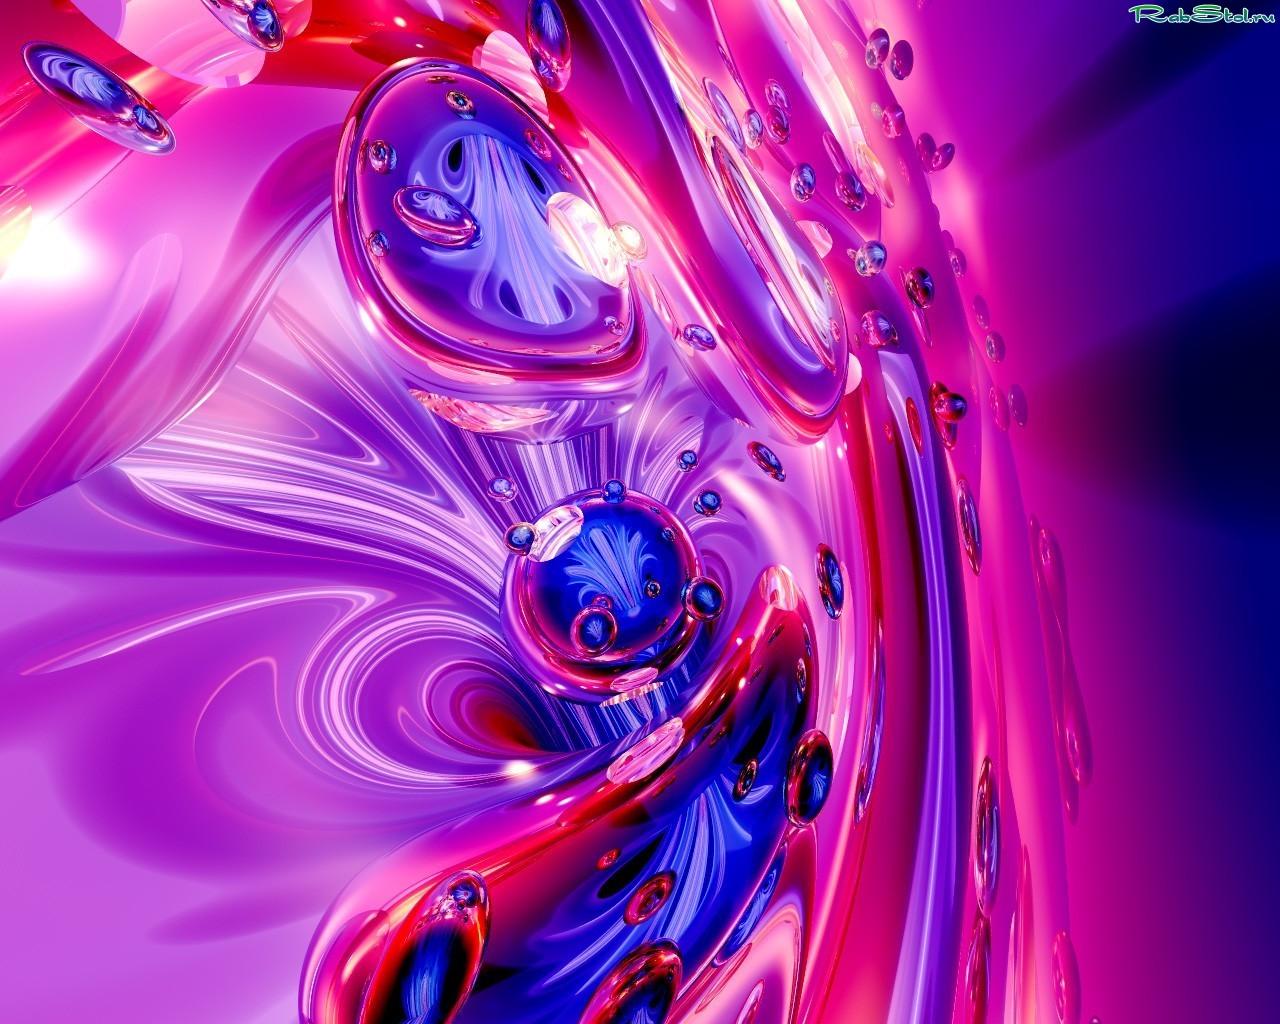 http://rabstol.ru/wallpapers/da78022242ab5abf71509953b6620082/3864_4.jpg